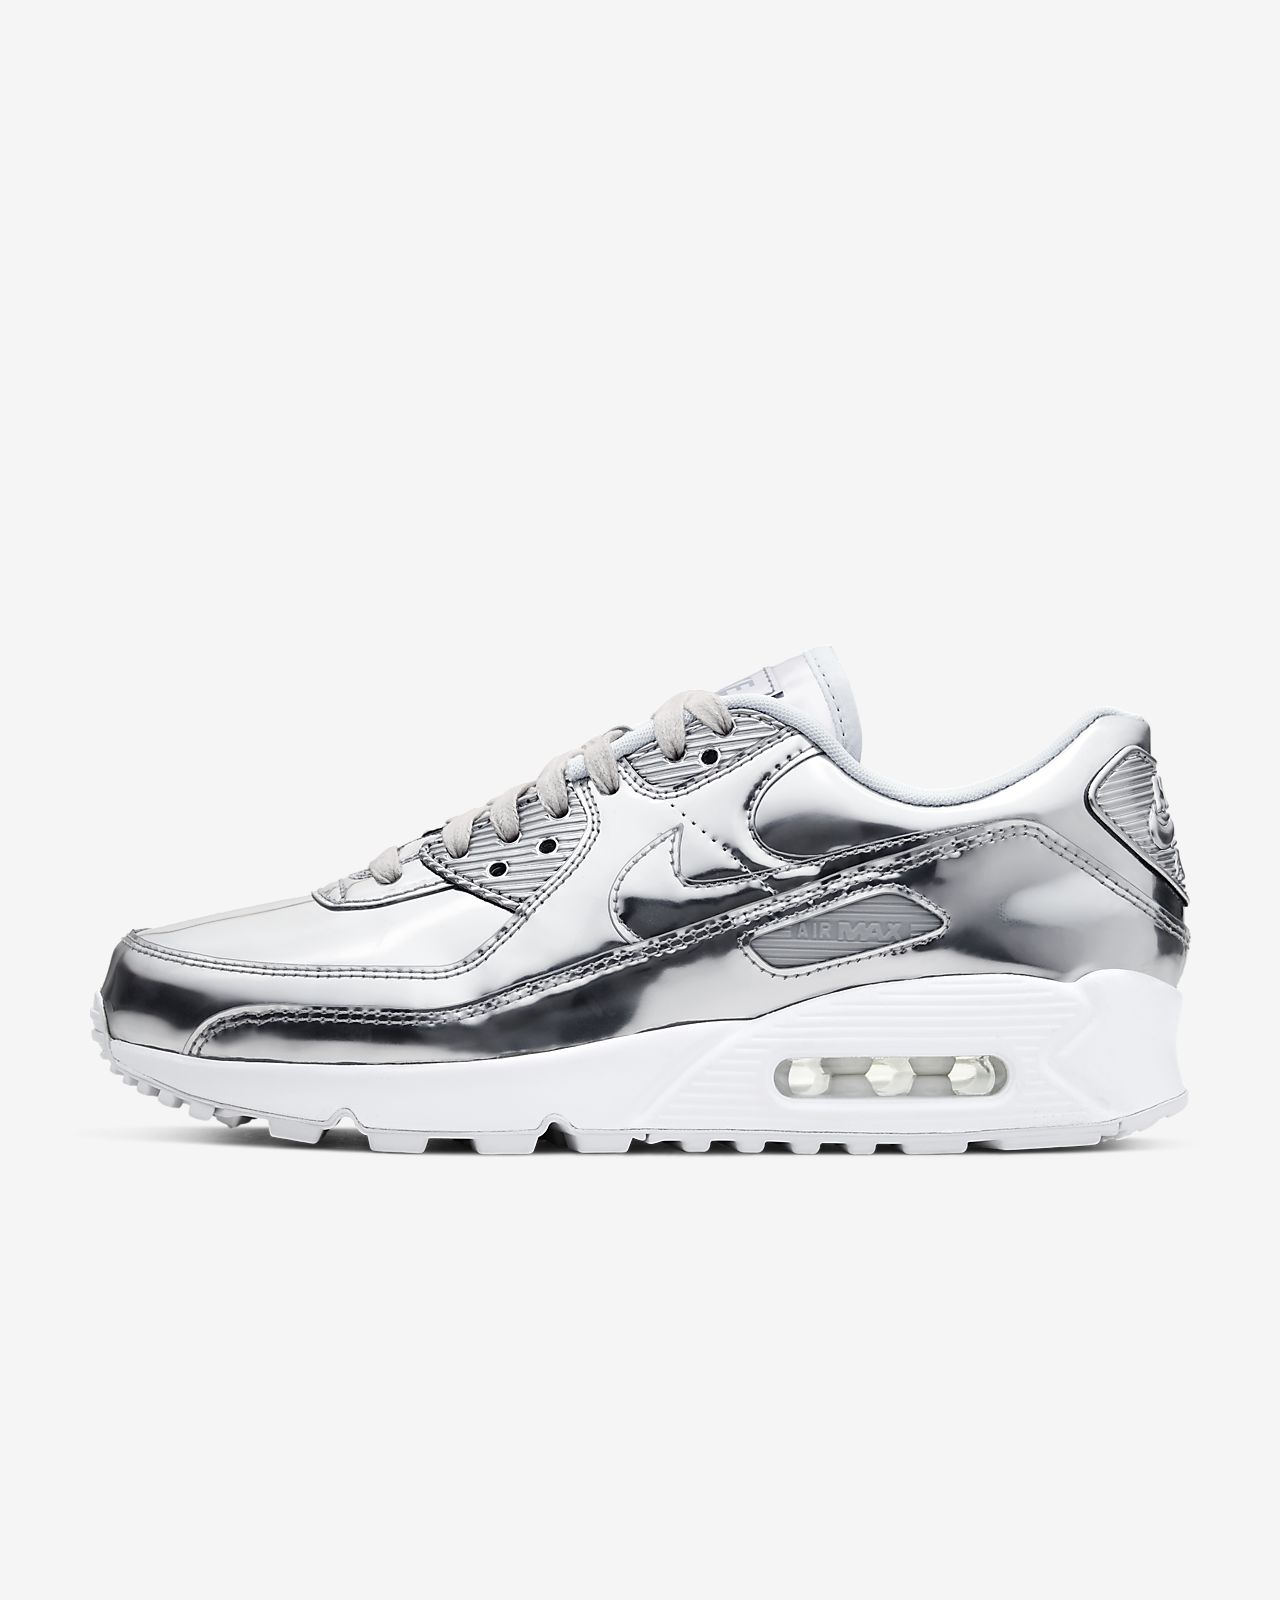 Sverige Nike Air Max 90 Og Kvinna Man Skor White Neutral